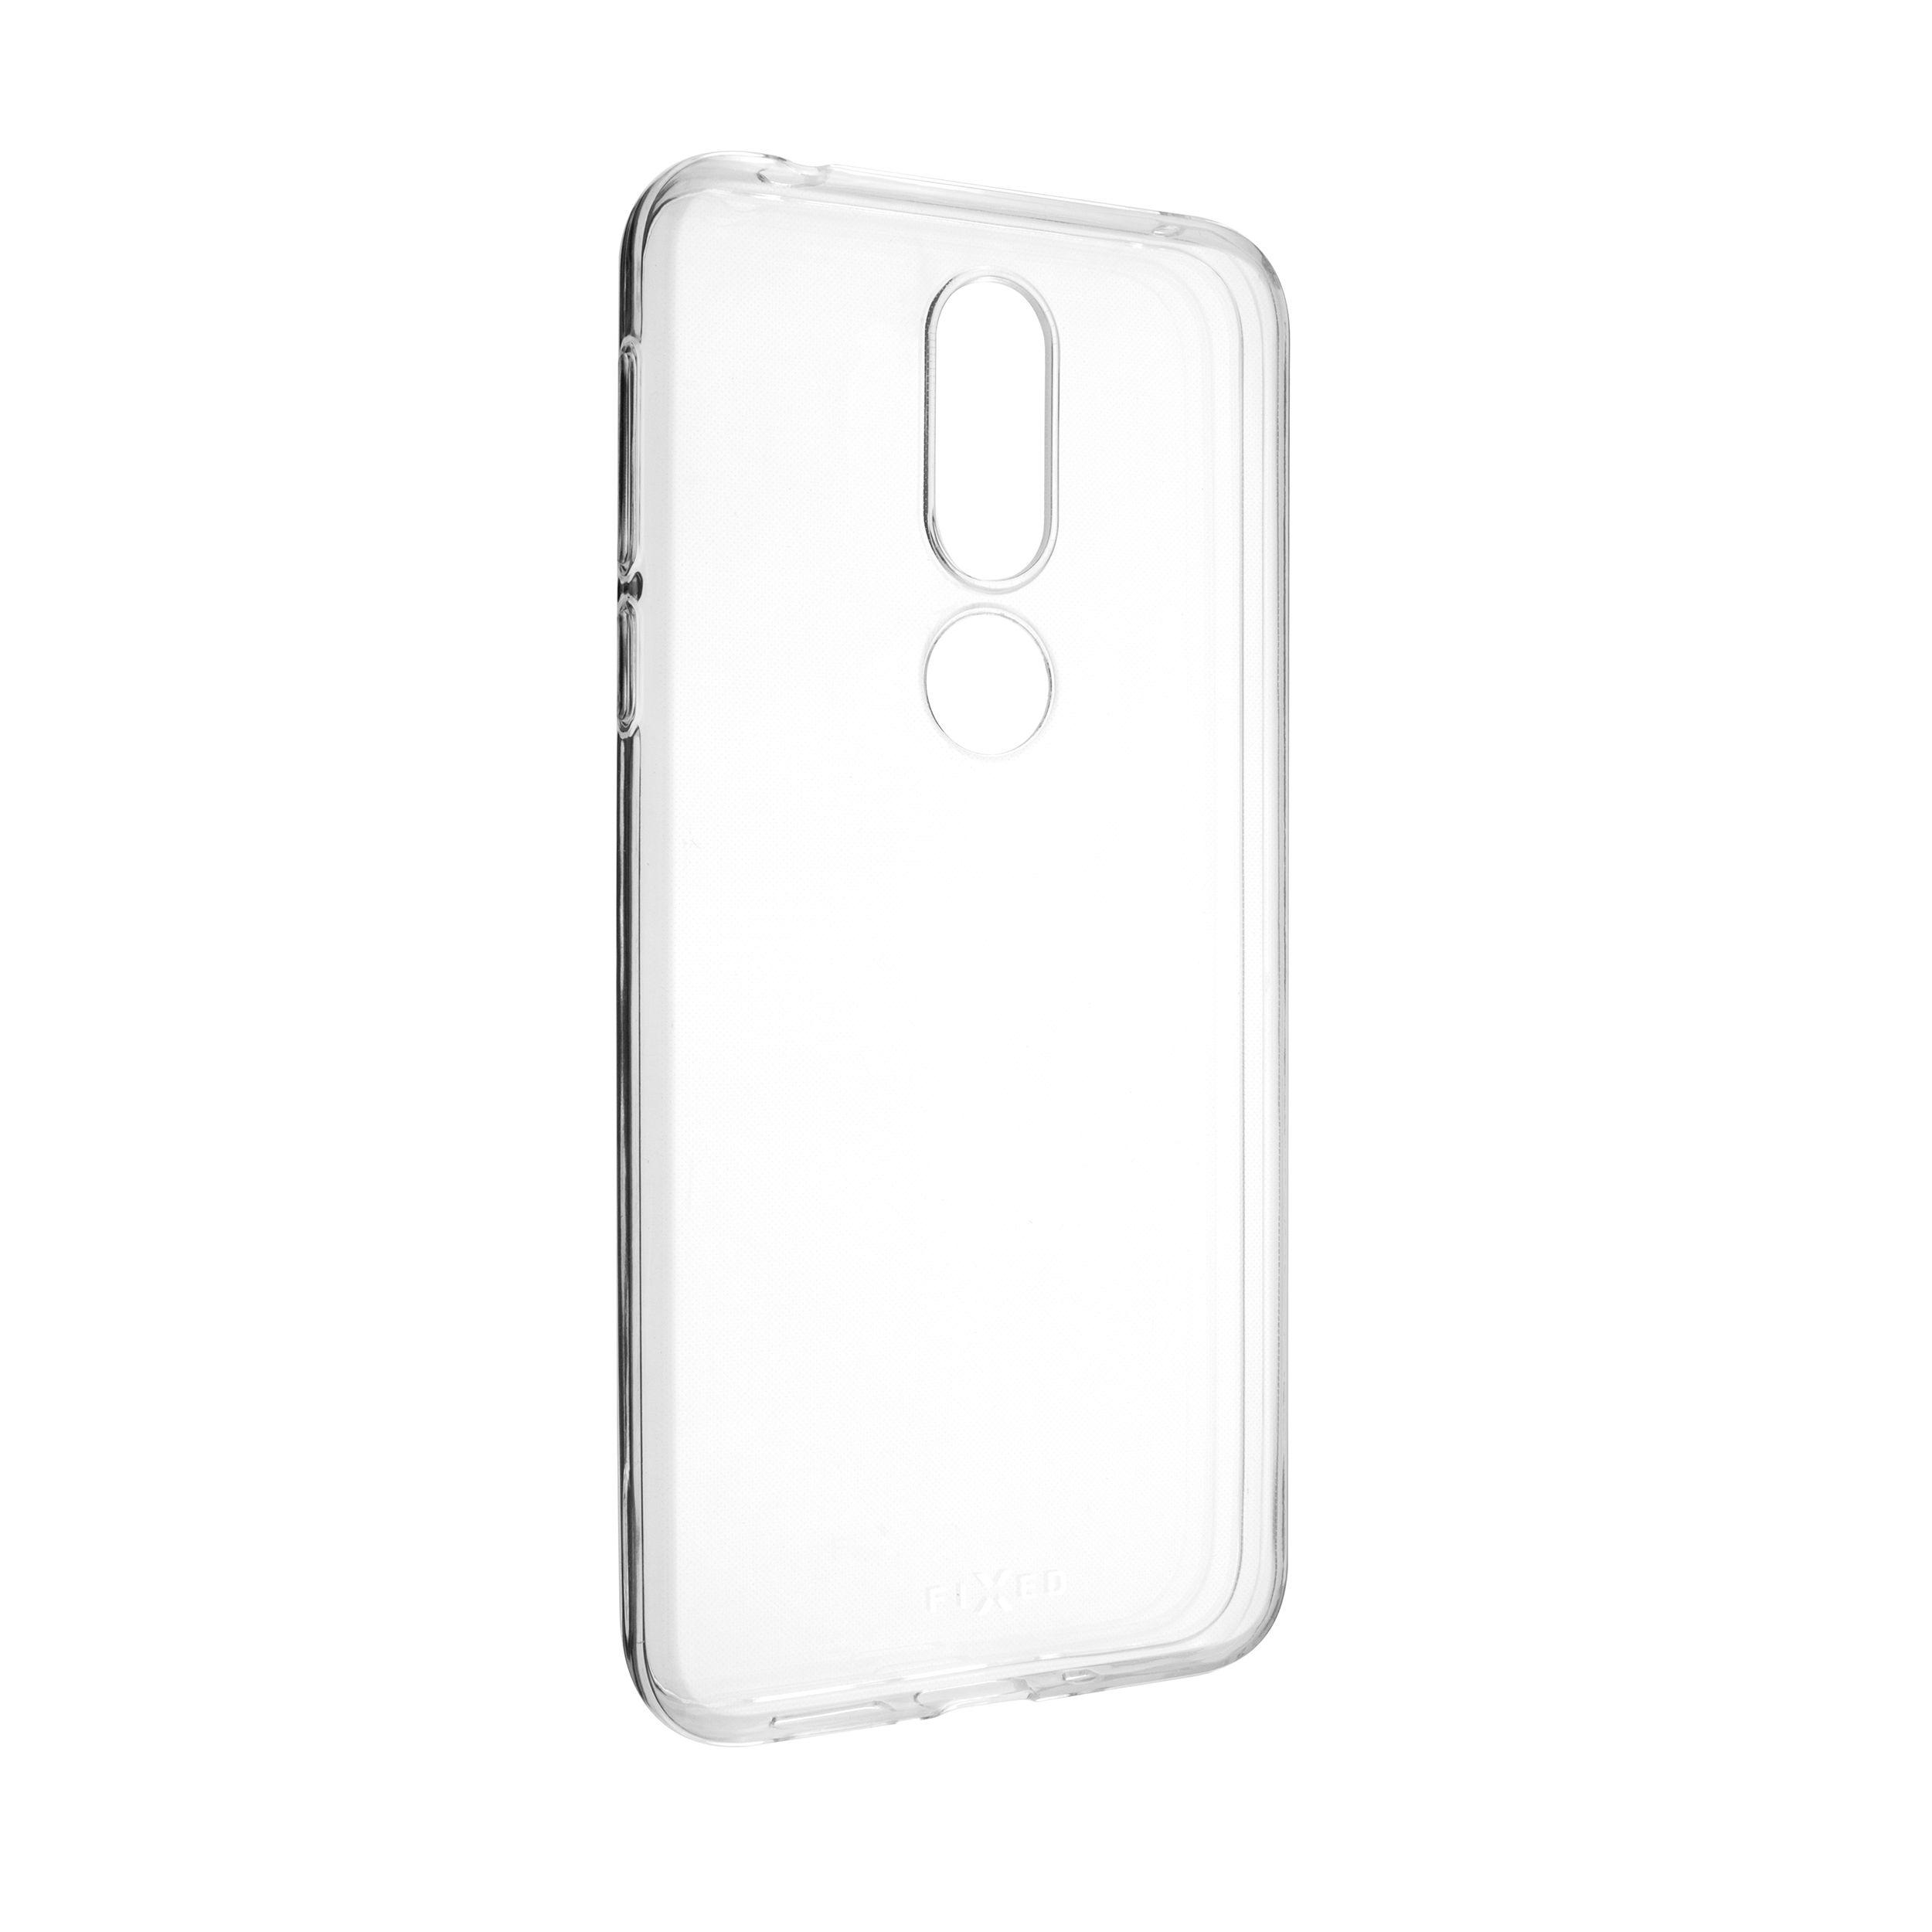 TPU gelové pouzdro FIXED pro Nokia 7.1, čiré